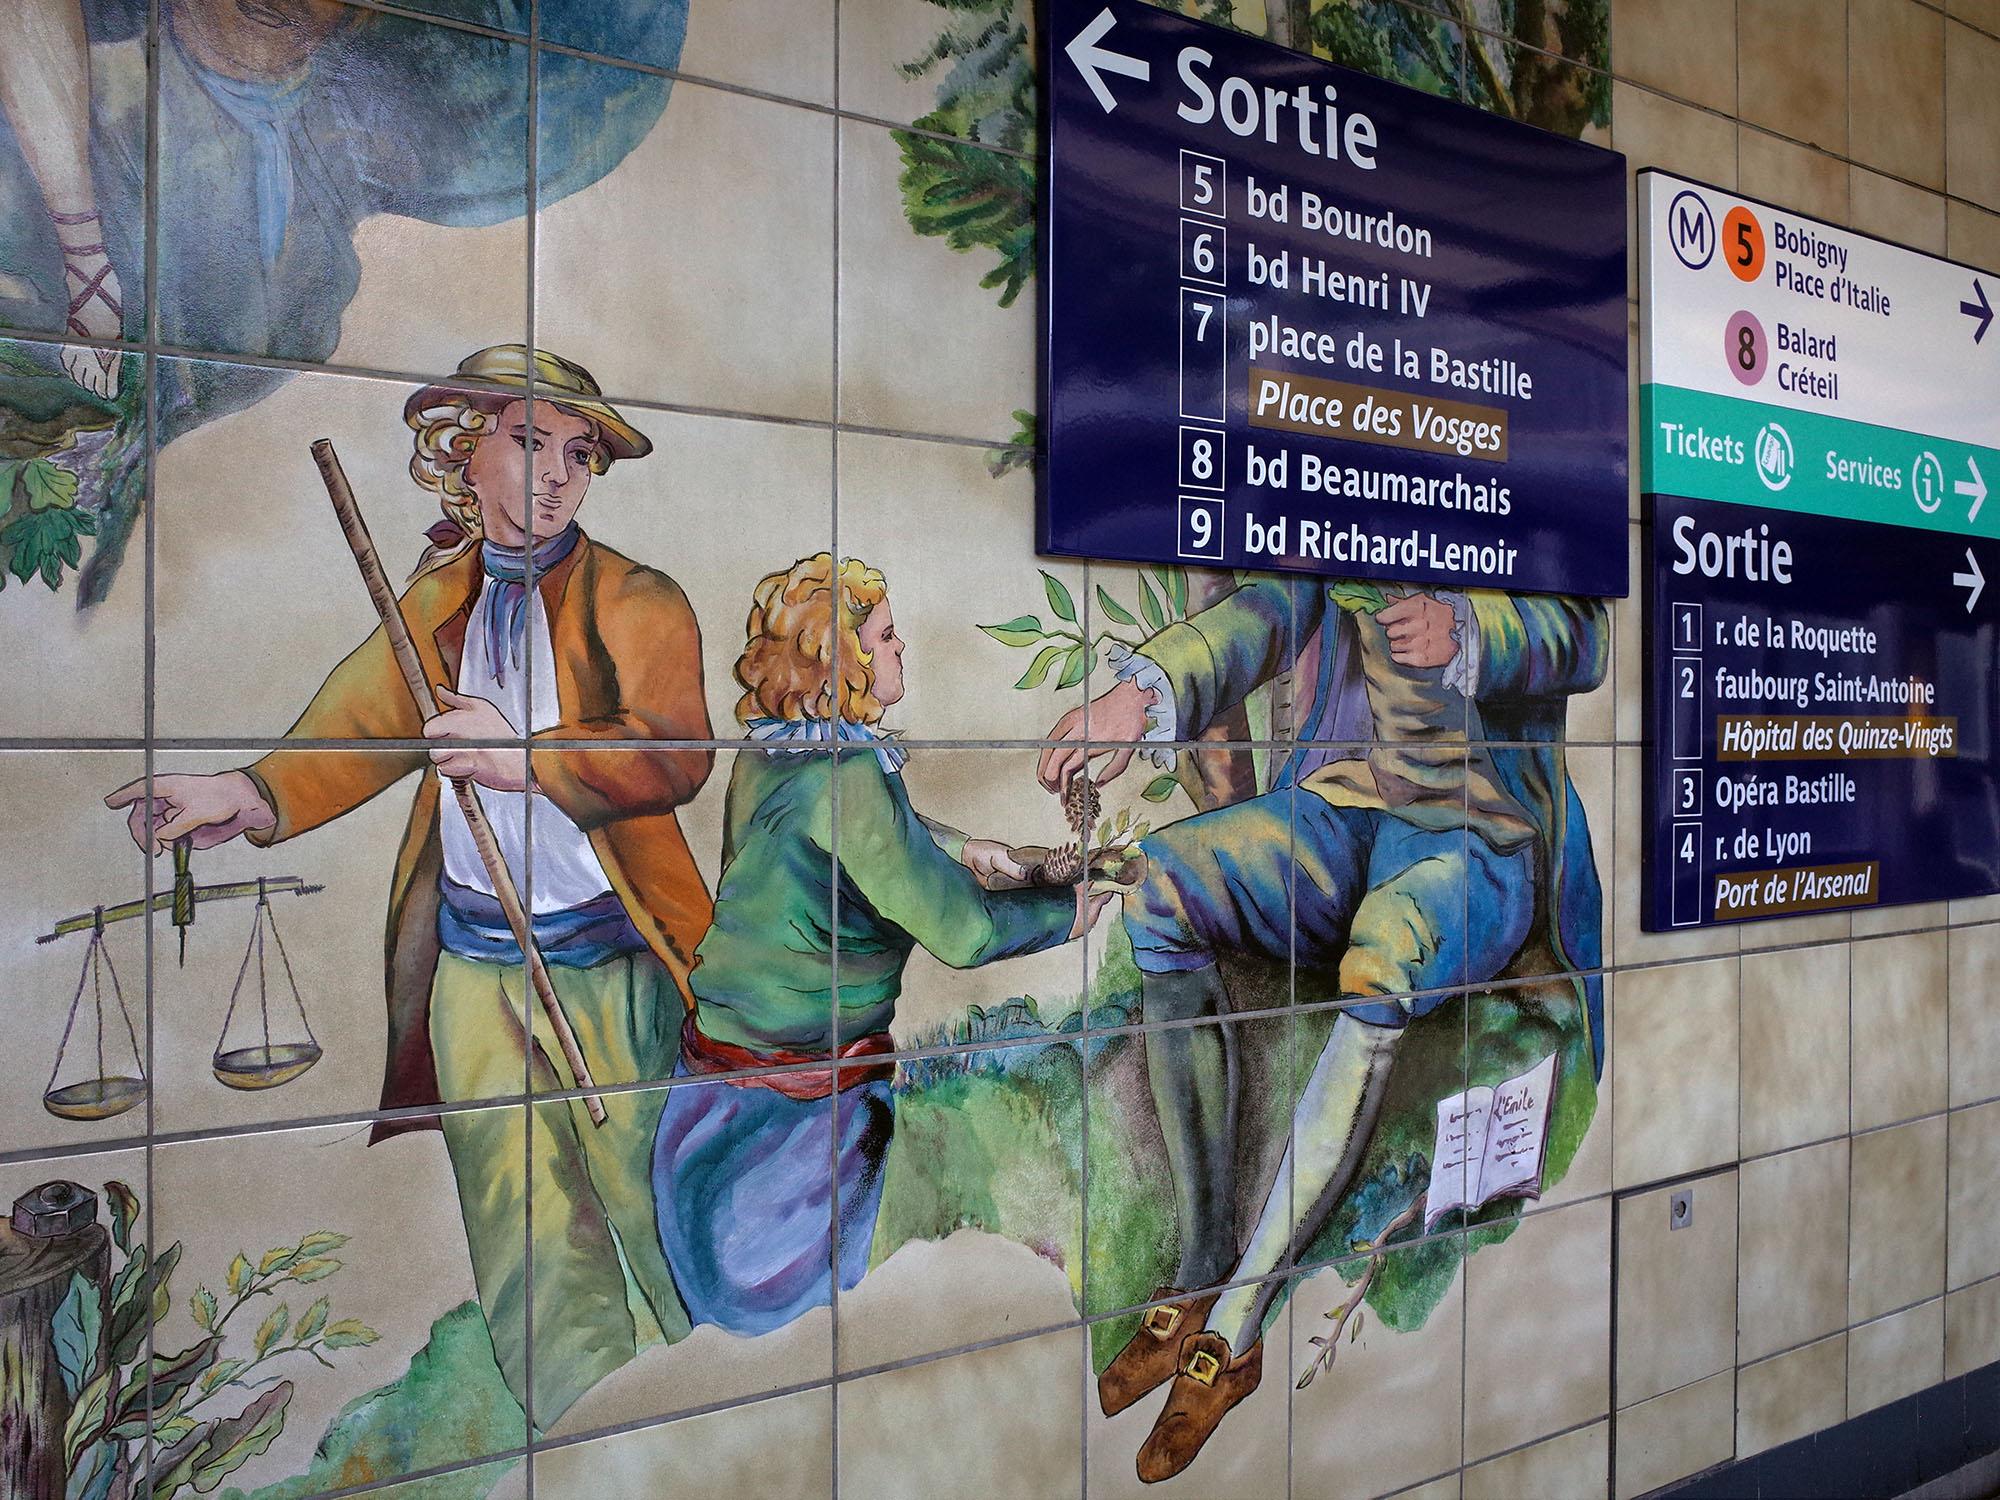 bastille-metro-rousseau-2015